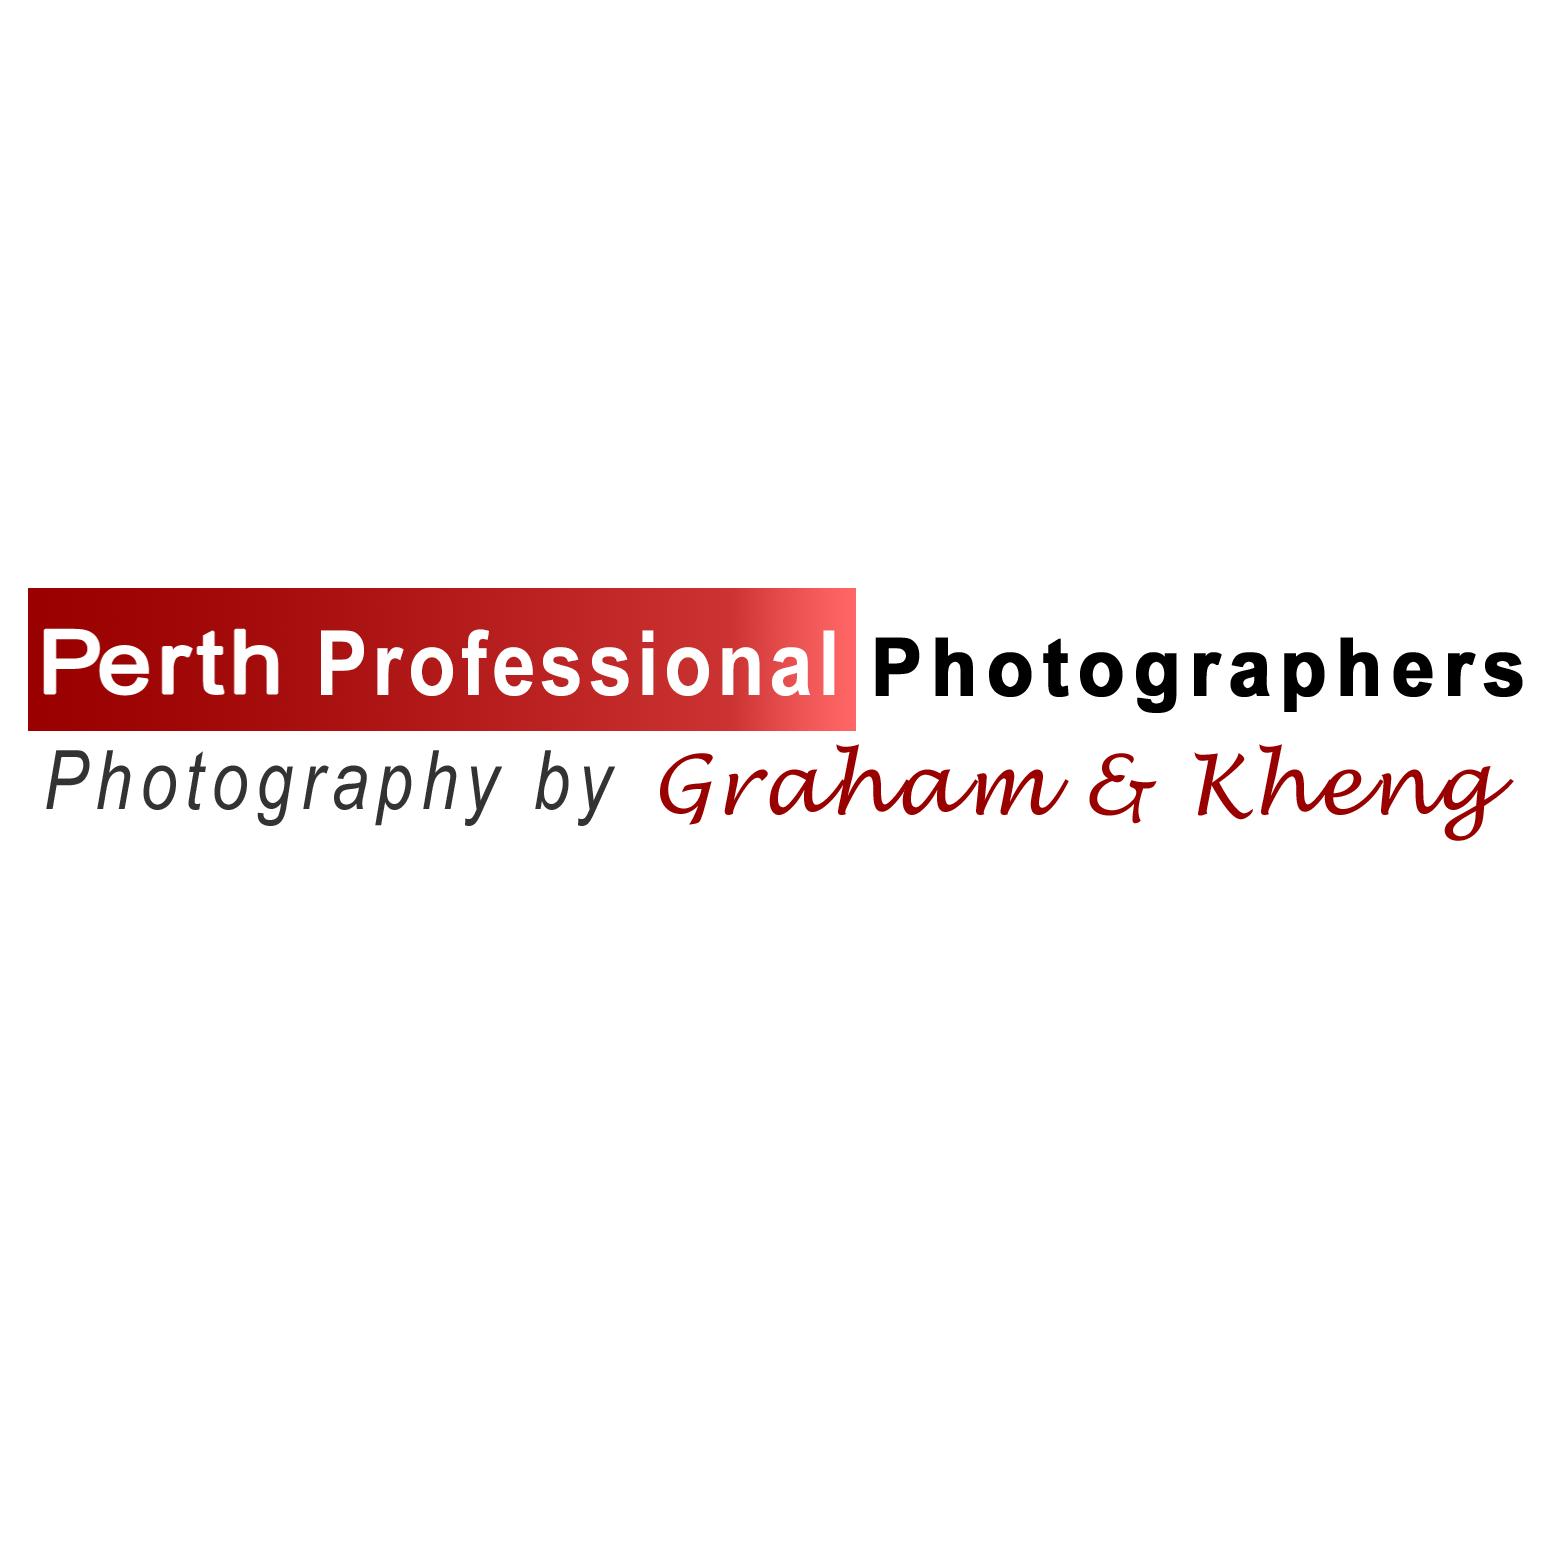 Graham & Kheng